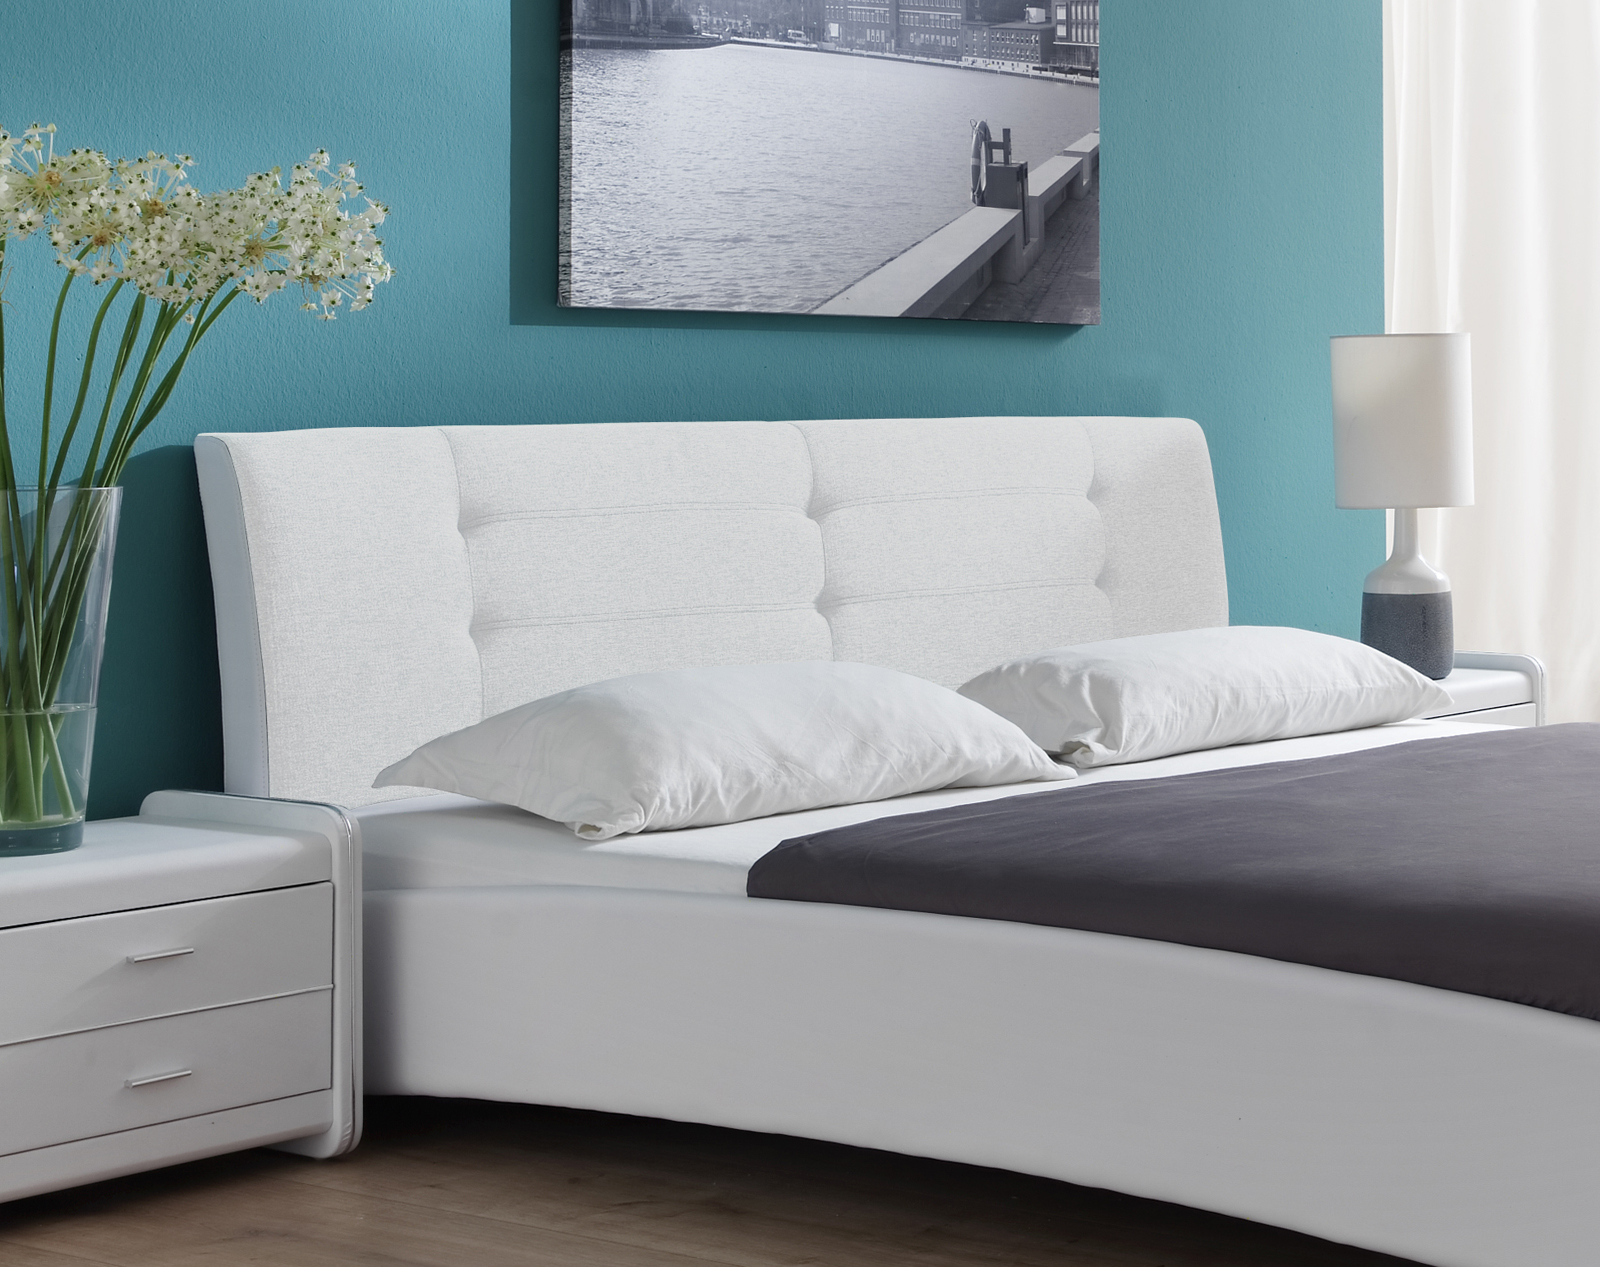 sam polsterbett doppelbett 200 x 200 cm wei bebop demn chst. Black Bedroom Furniture Sets. Home Design Ideas